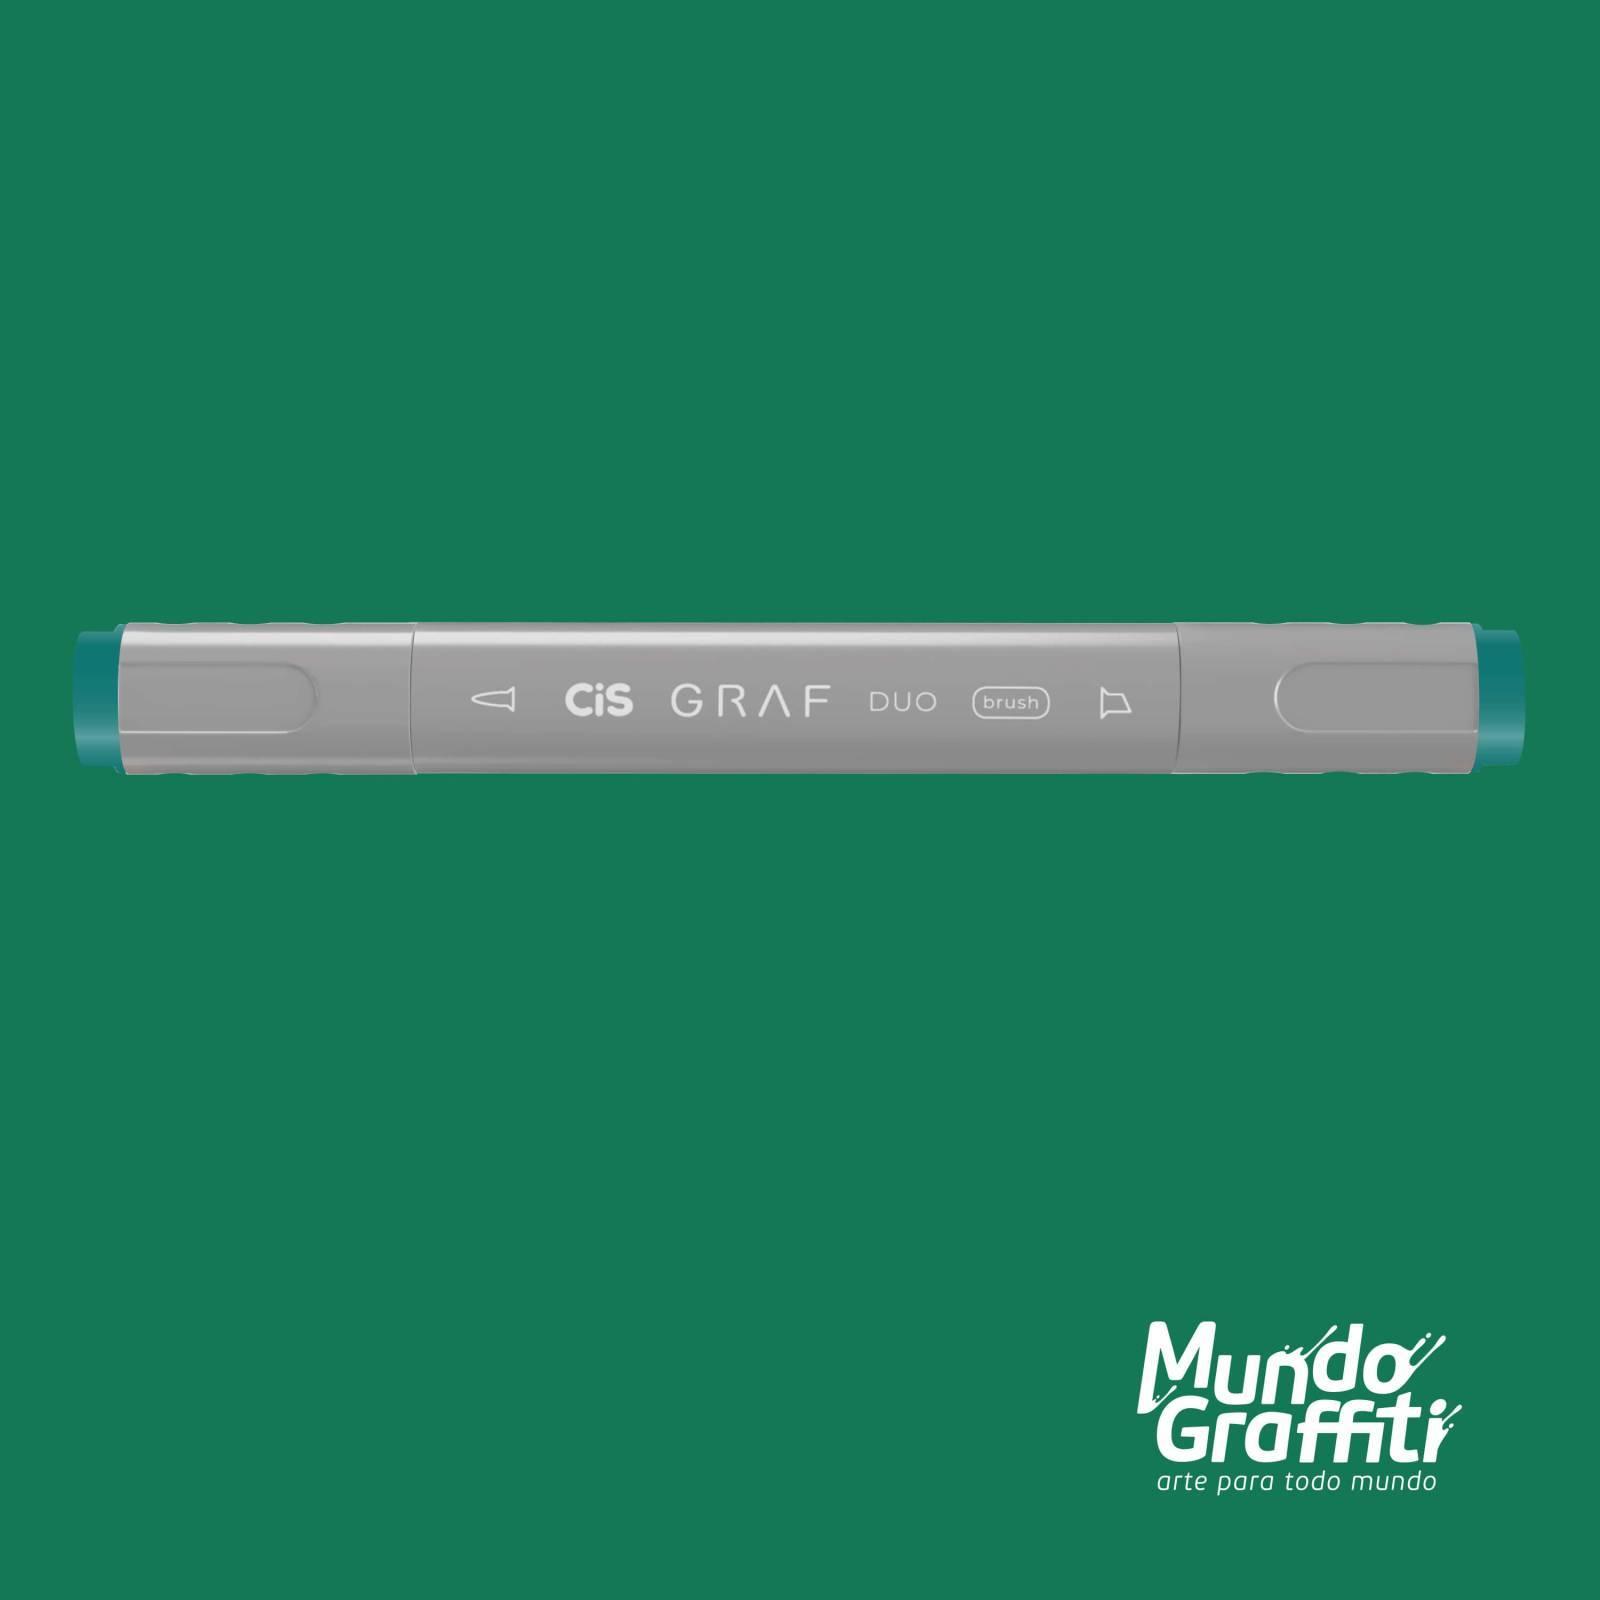 Marcador Cis Graf Duo Brush Turquoise Green 53 - Mundo Graffiti